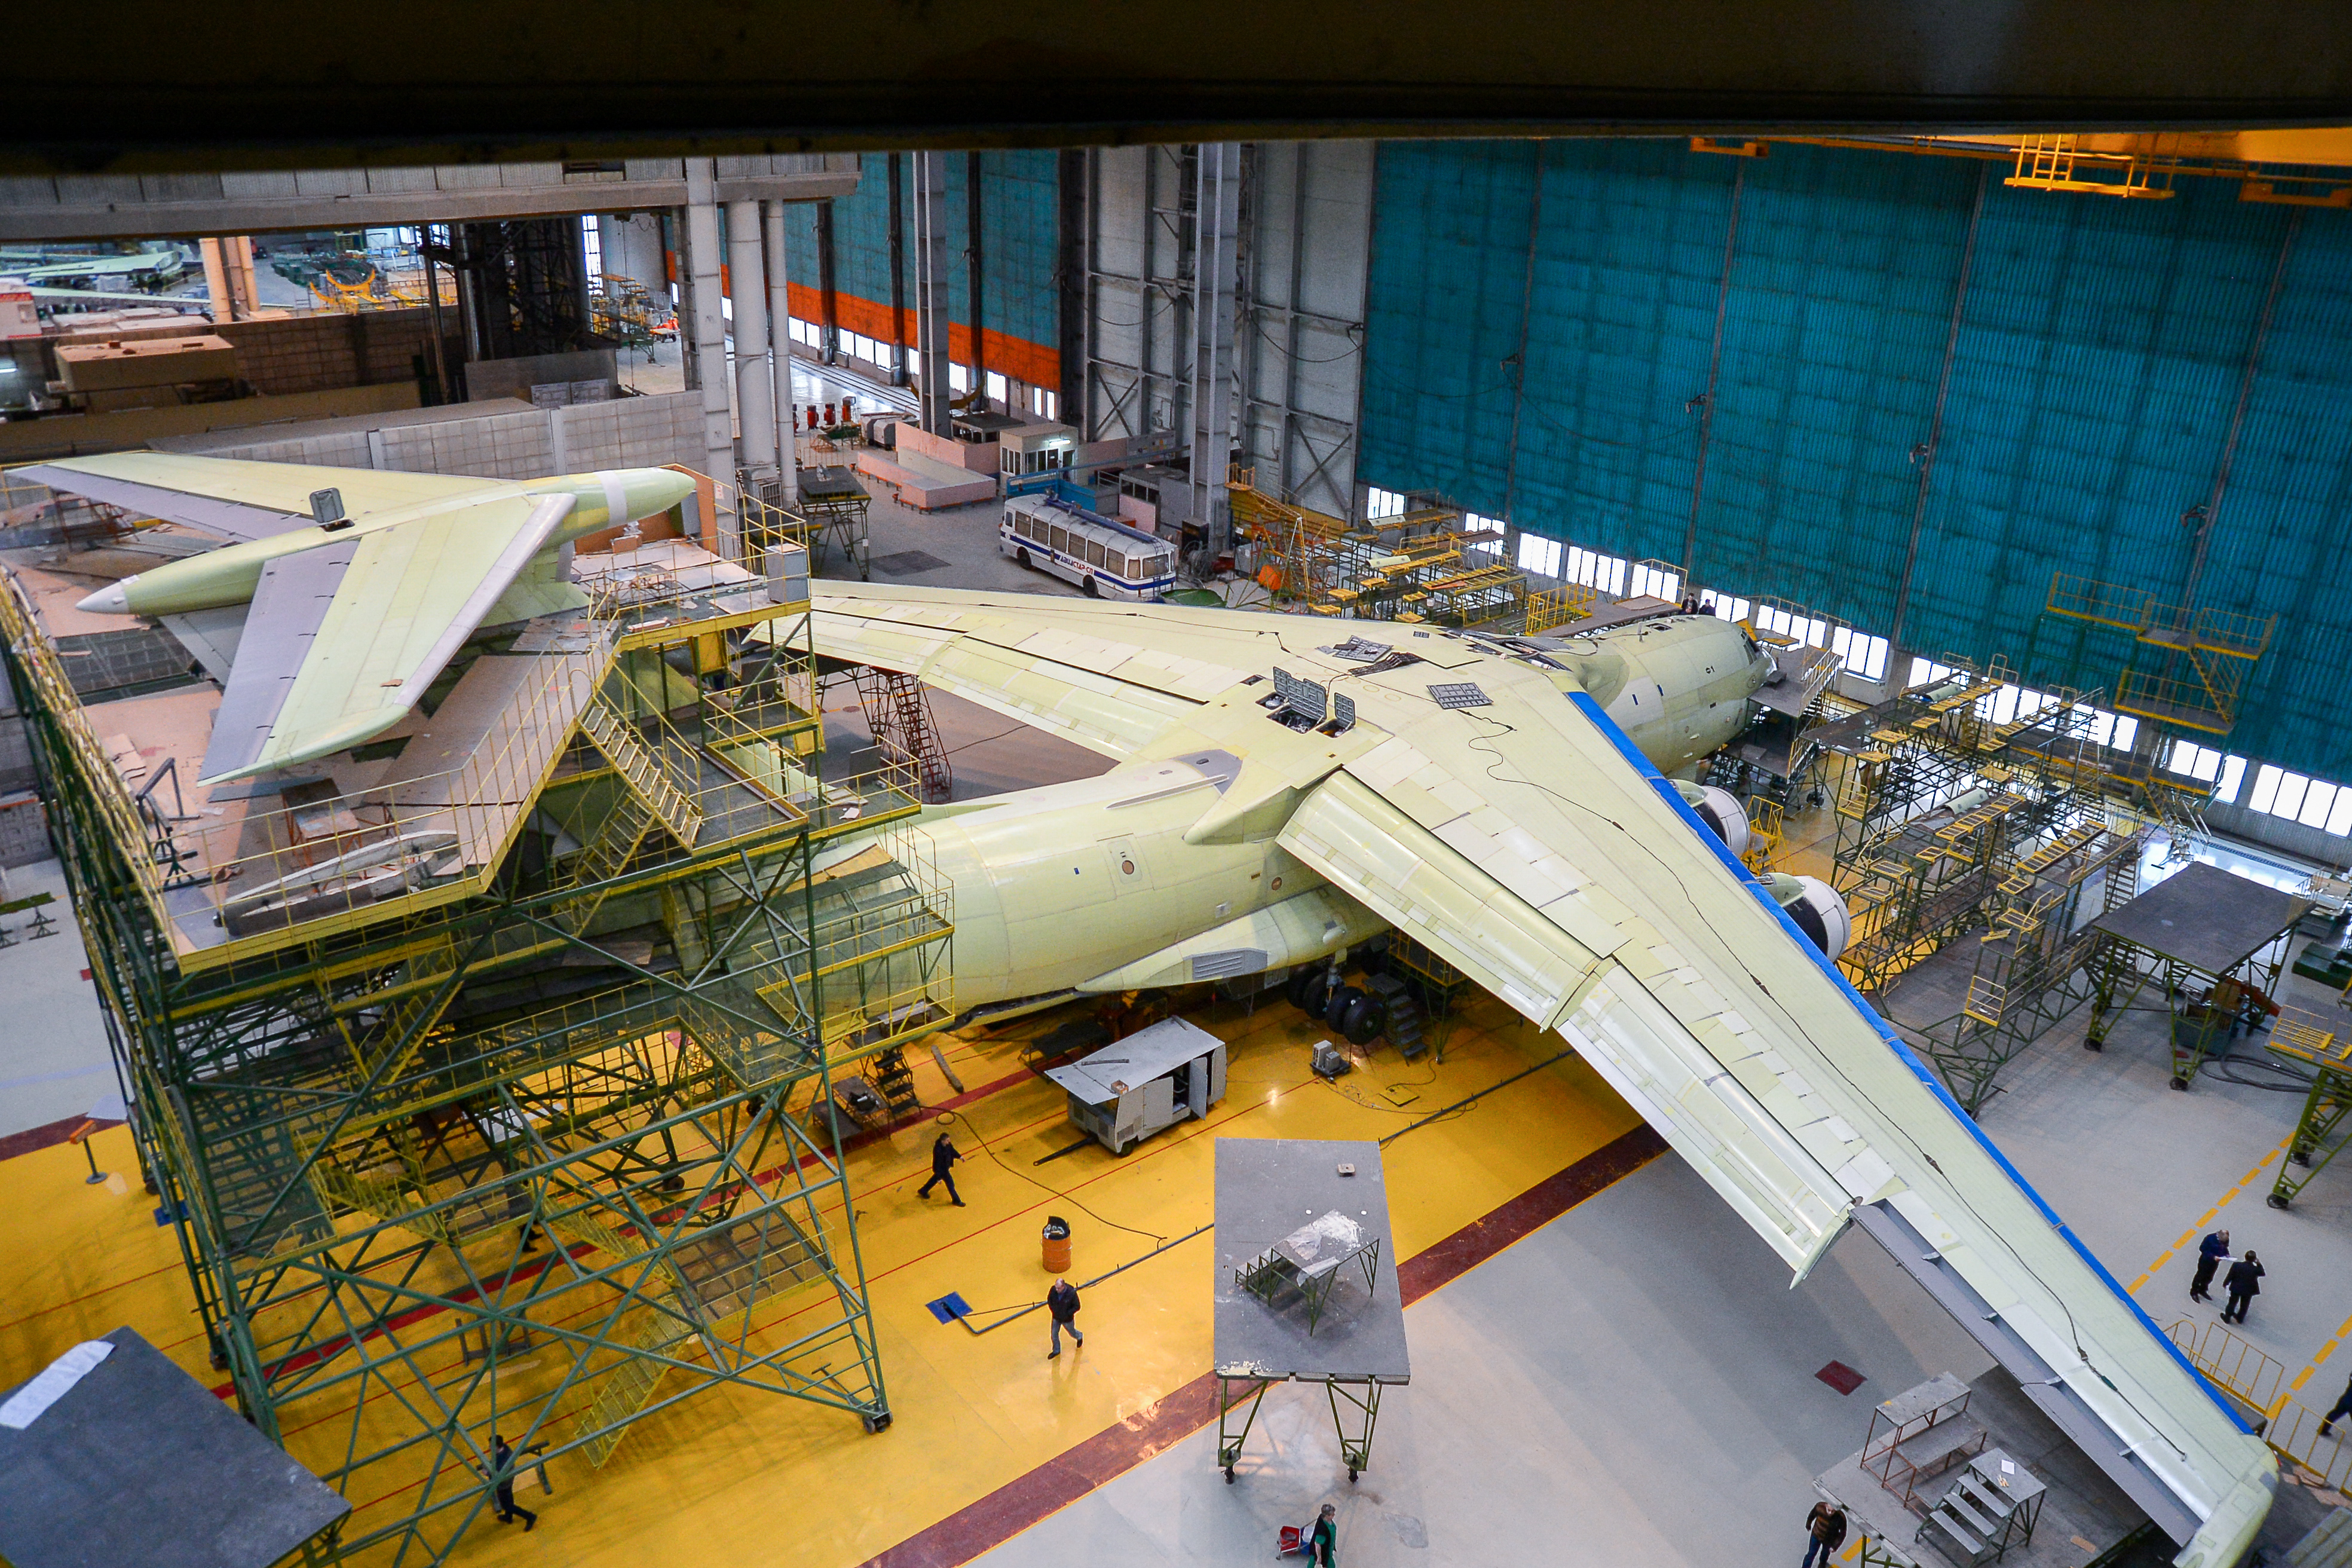 Il-76/476 Military Transports - Page 9 Eevi4PqWsAITPp4?format=jpg&name=4096x4096